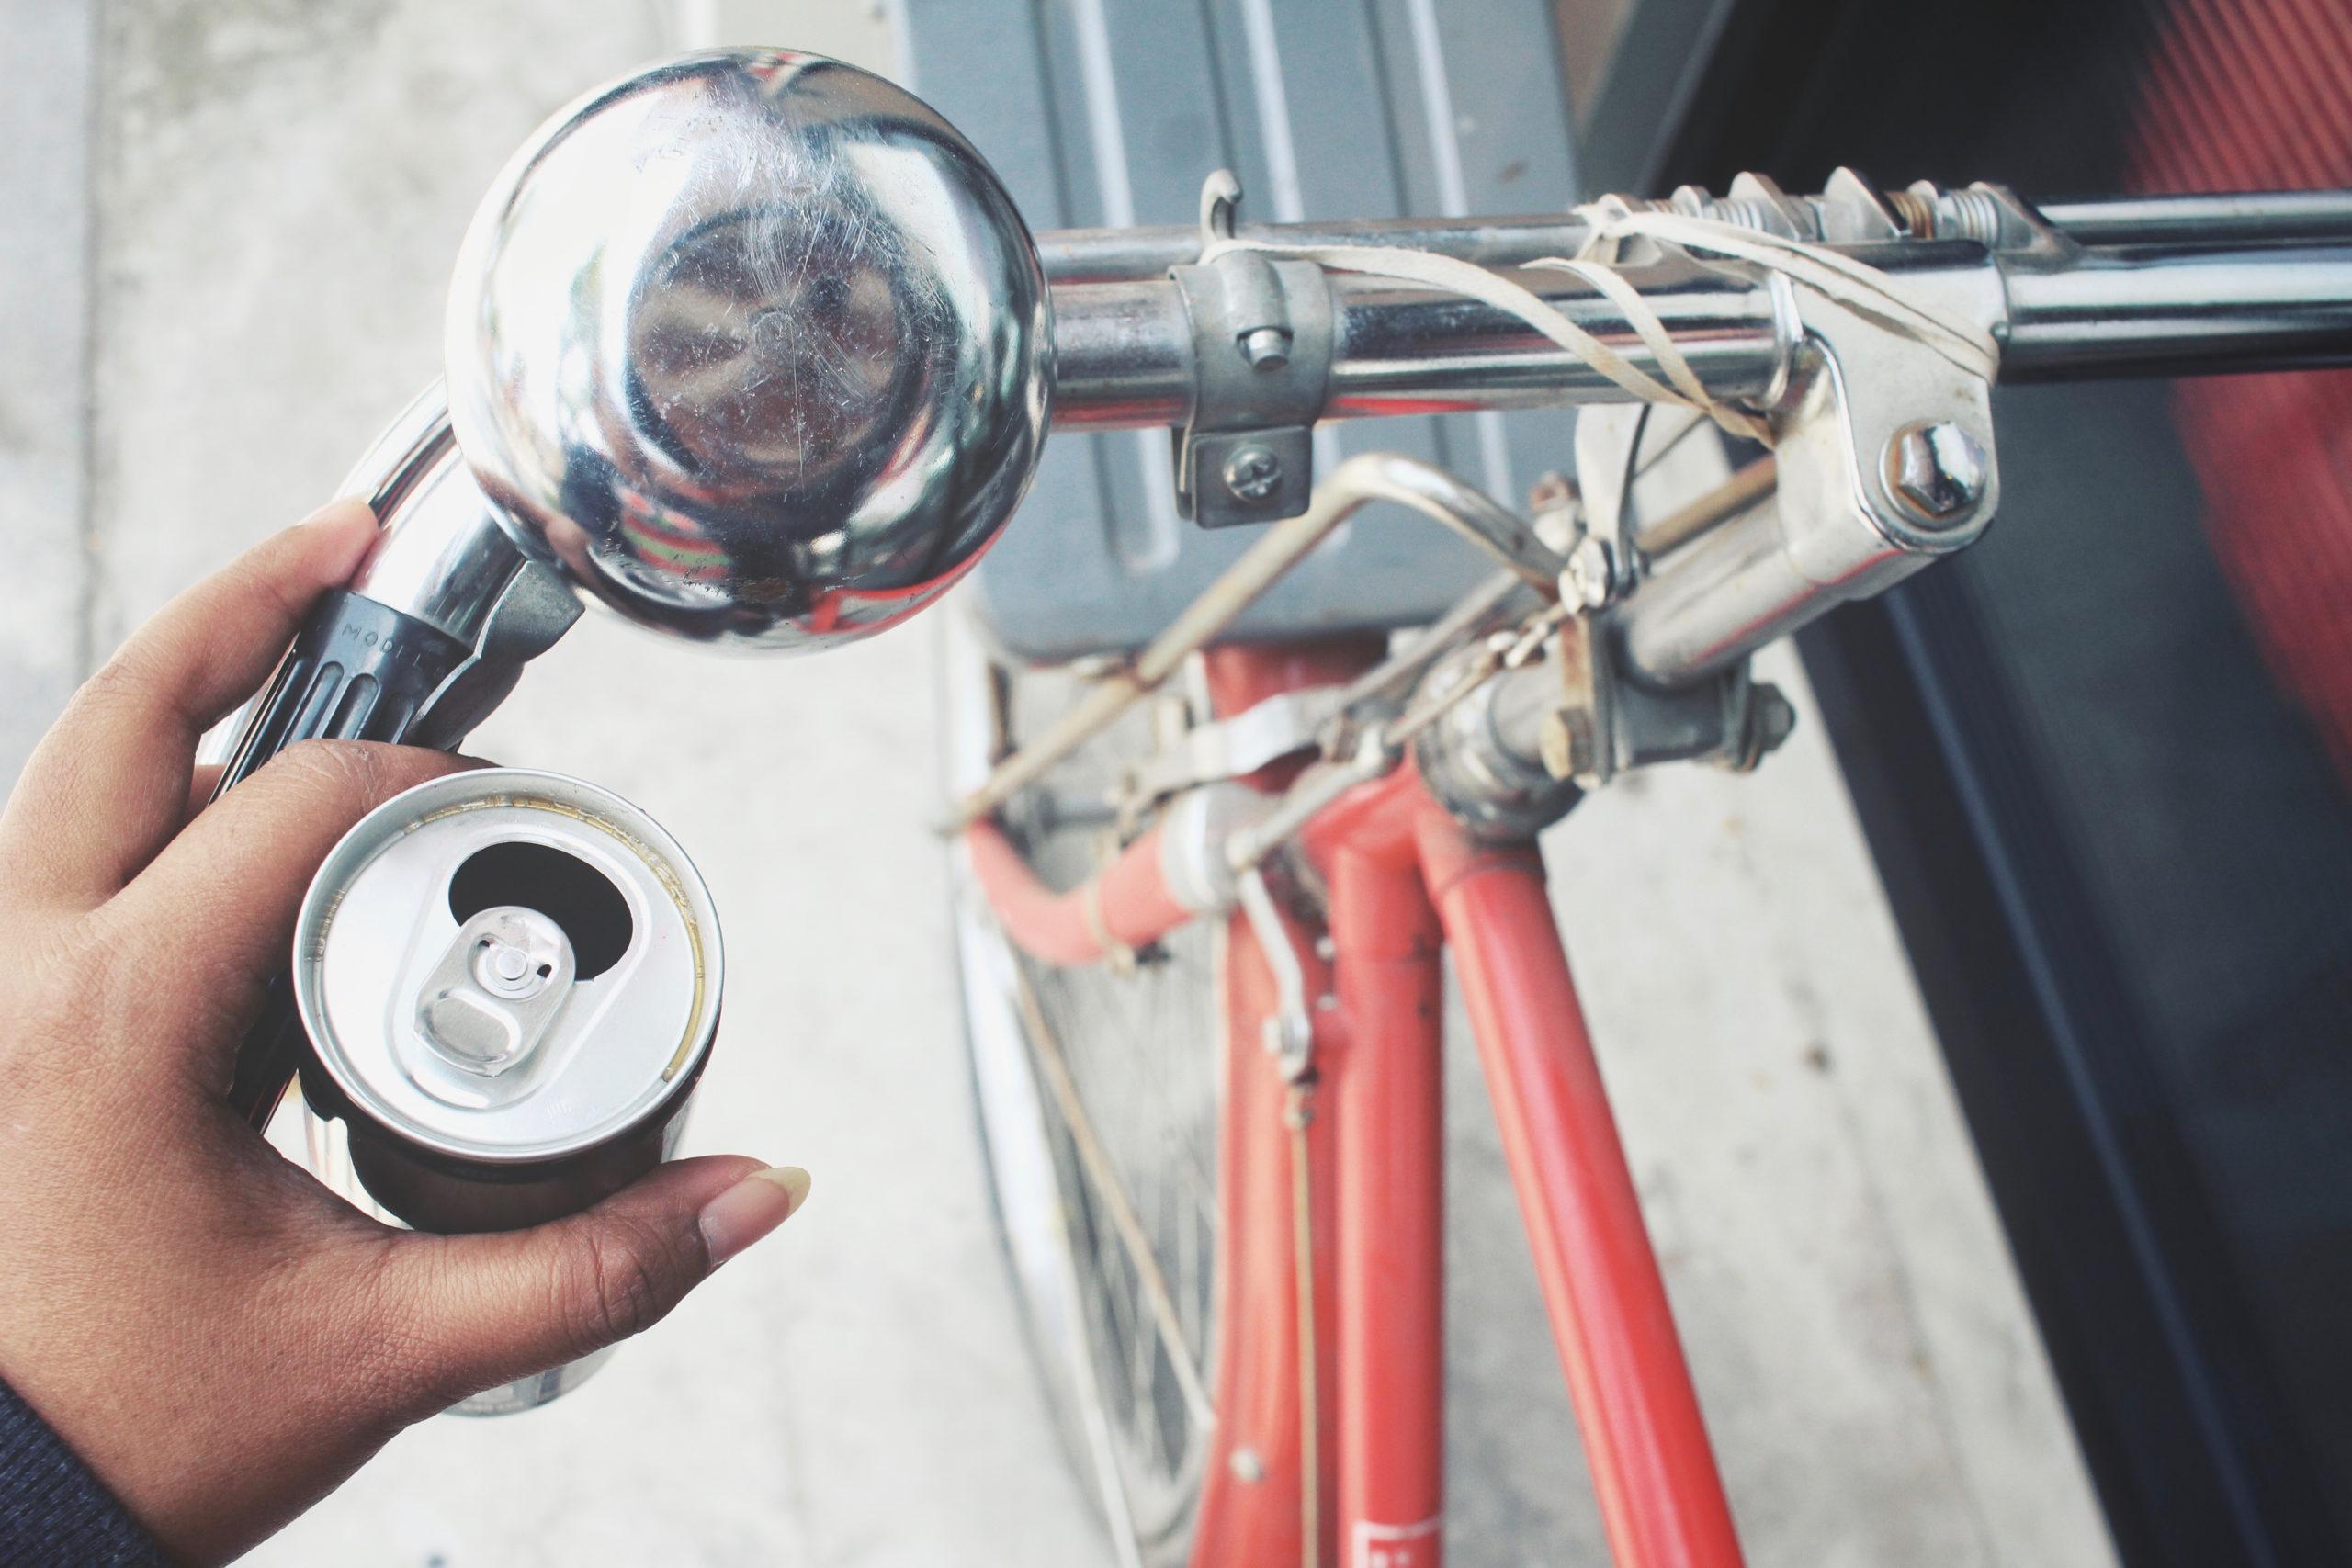 drinking and biking